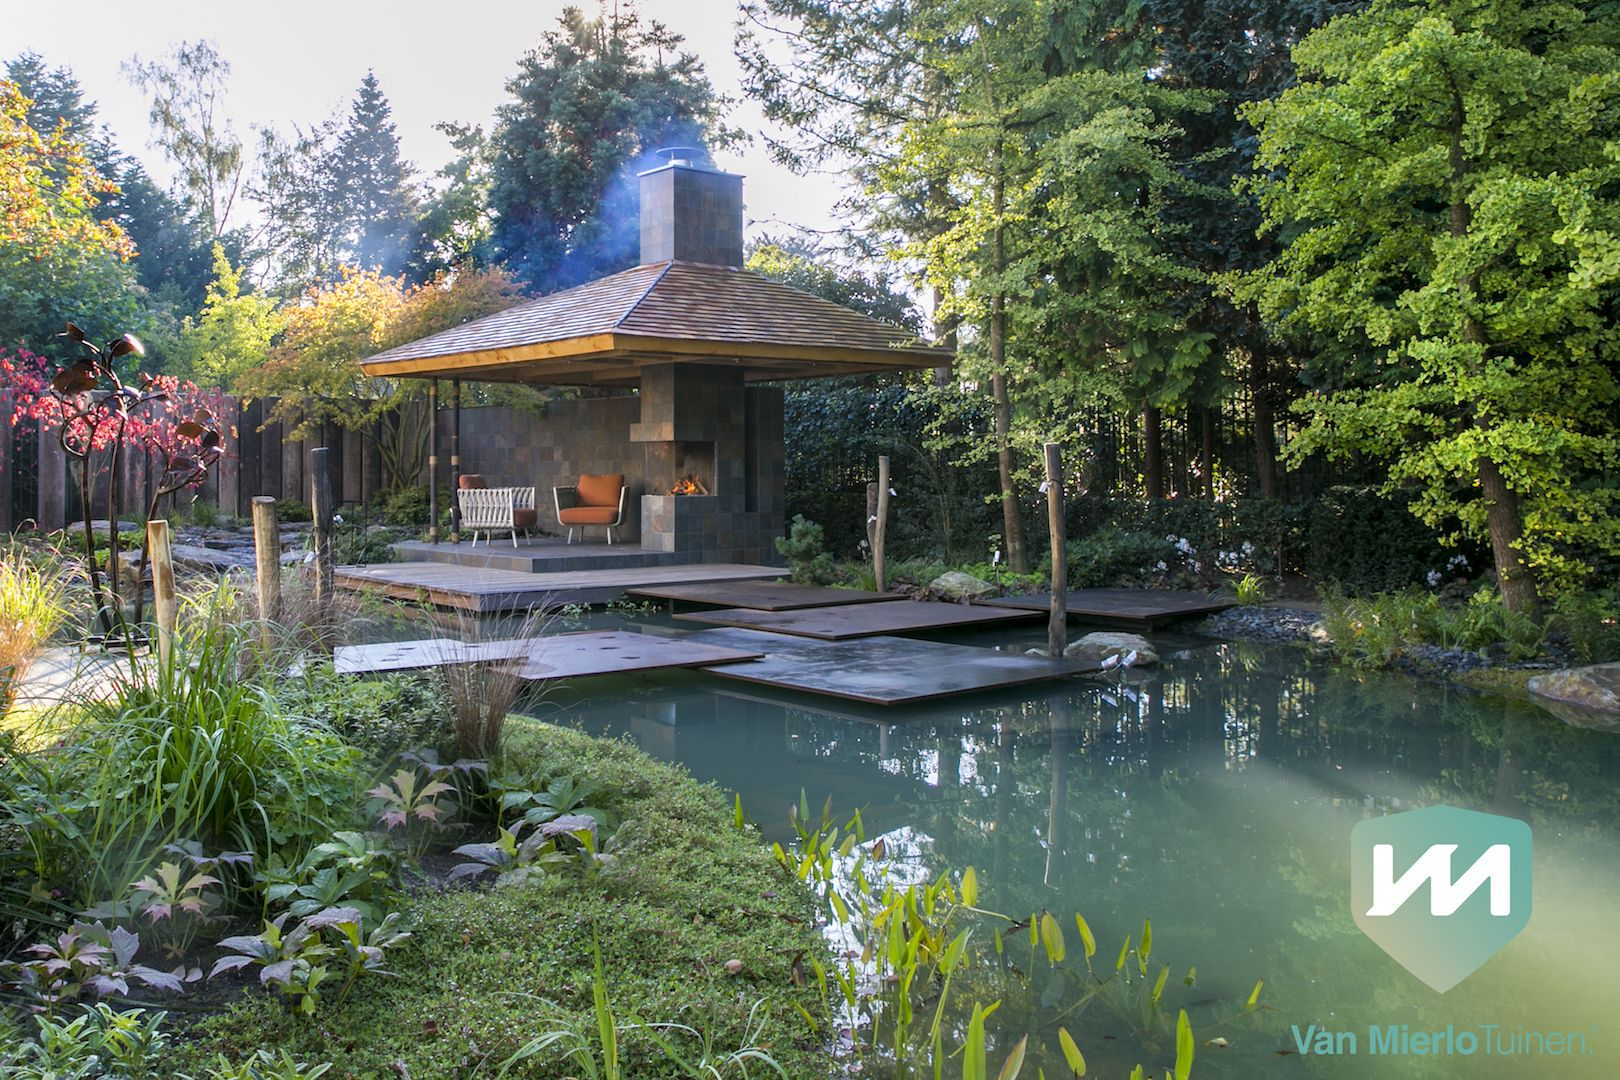 Van mierlo tuinen exclusieve japanse watertuin dutch wave